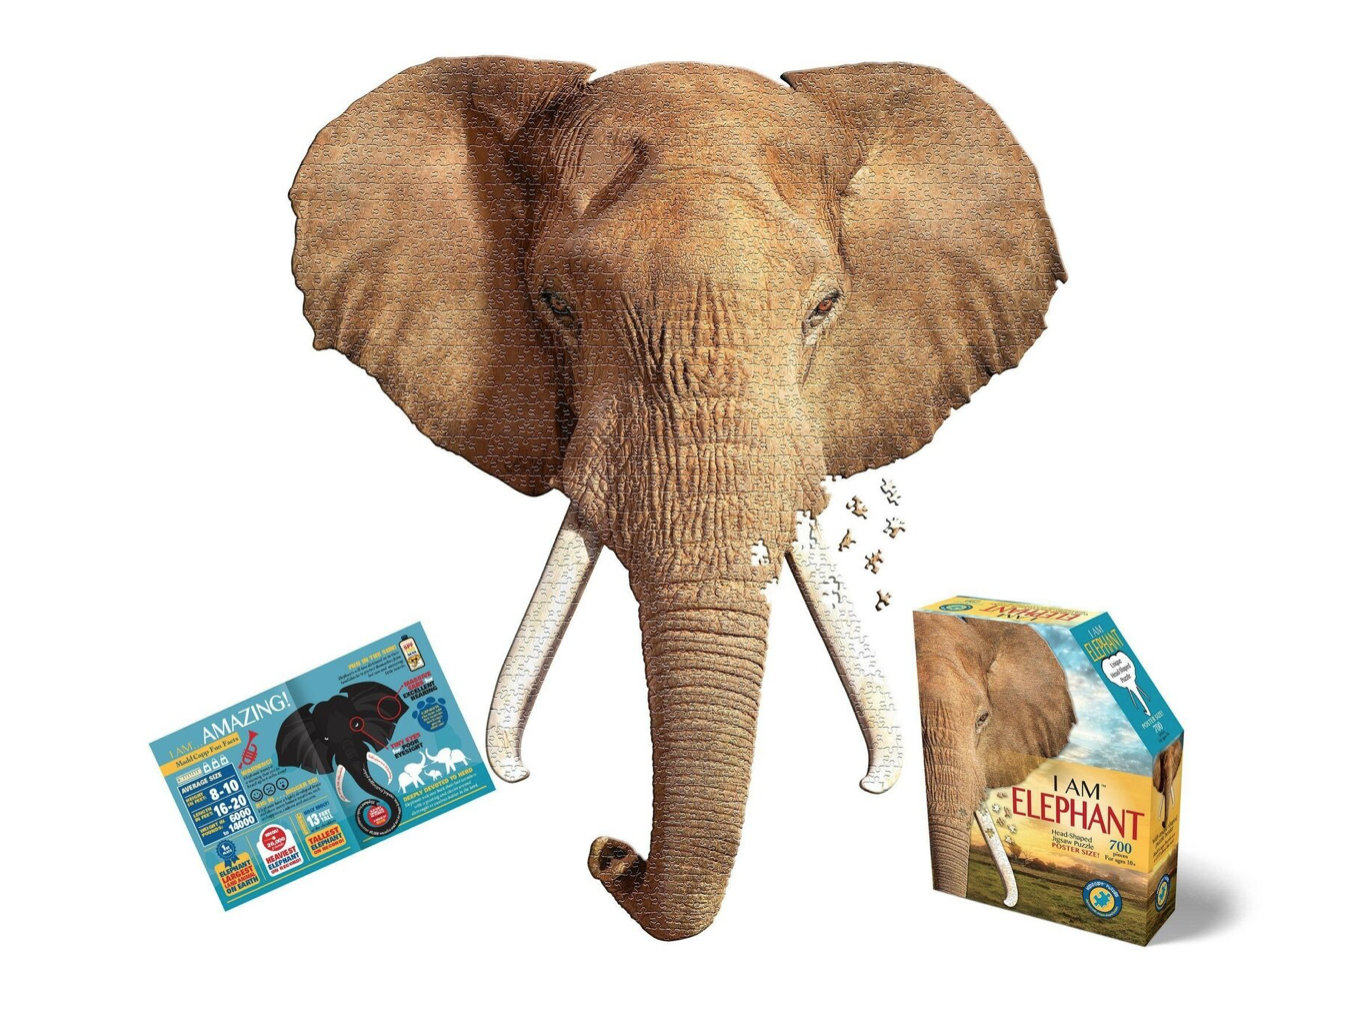 E11even I AM Elephant